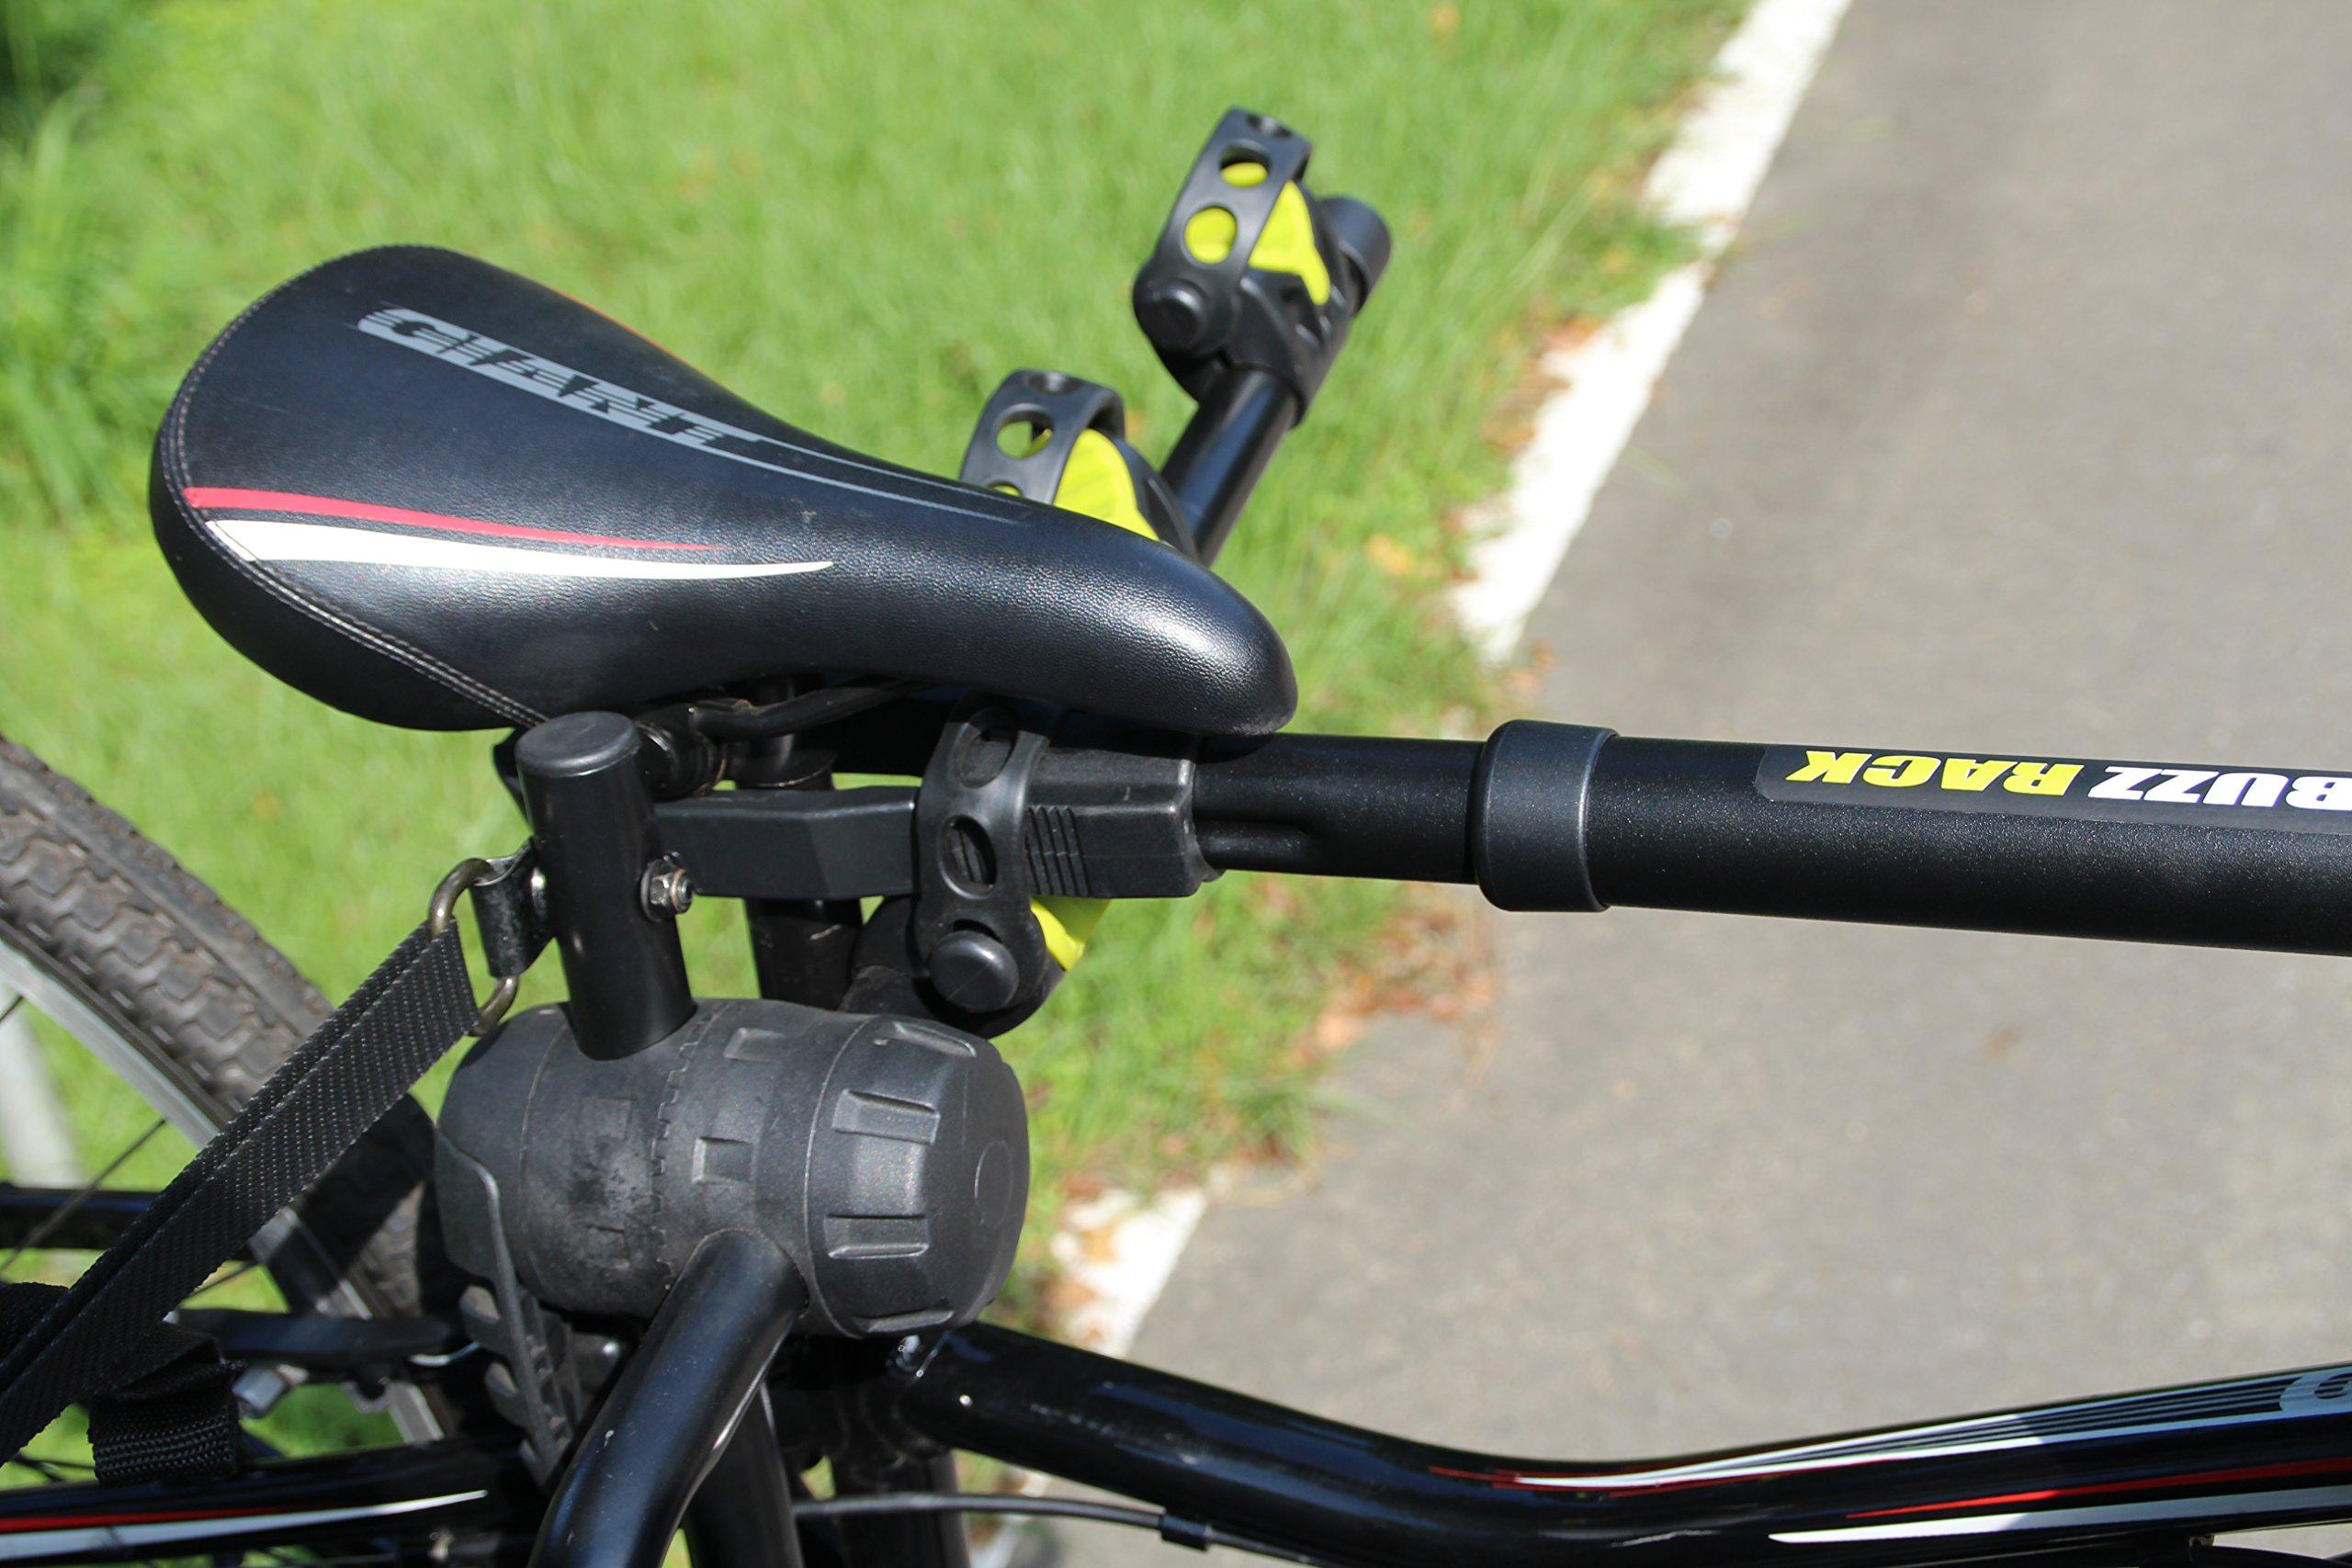 BUZZ RACK GRIP Deluxe Black Bike Top Frame Cross Bar Telescopic Adaptor by BUZZ RACK (Image #7)